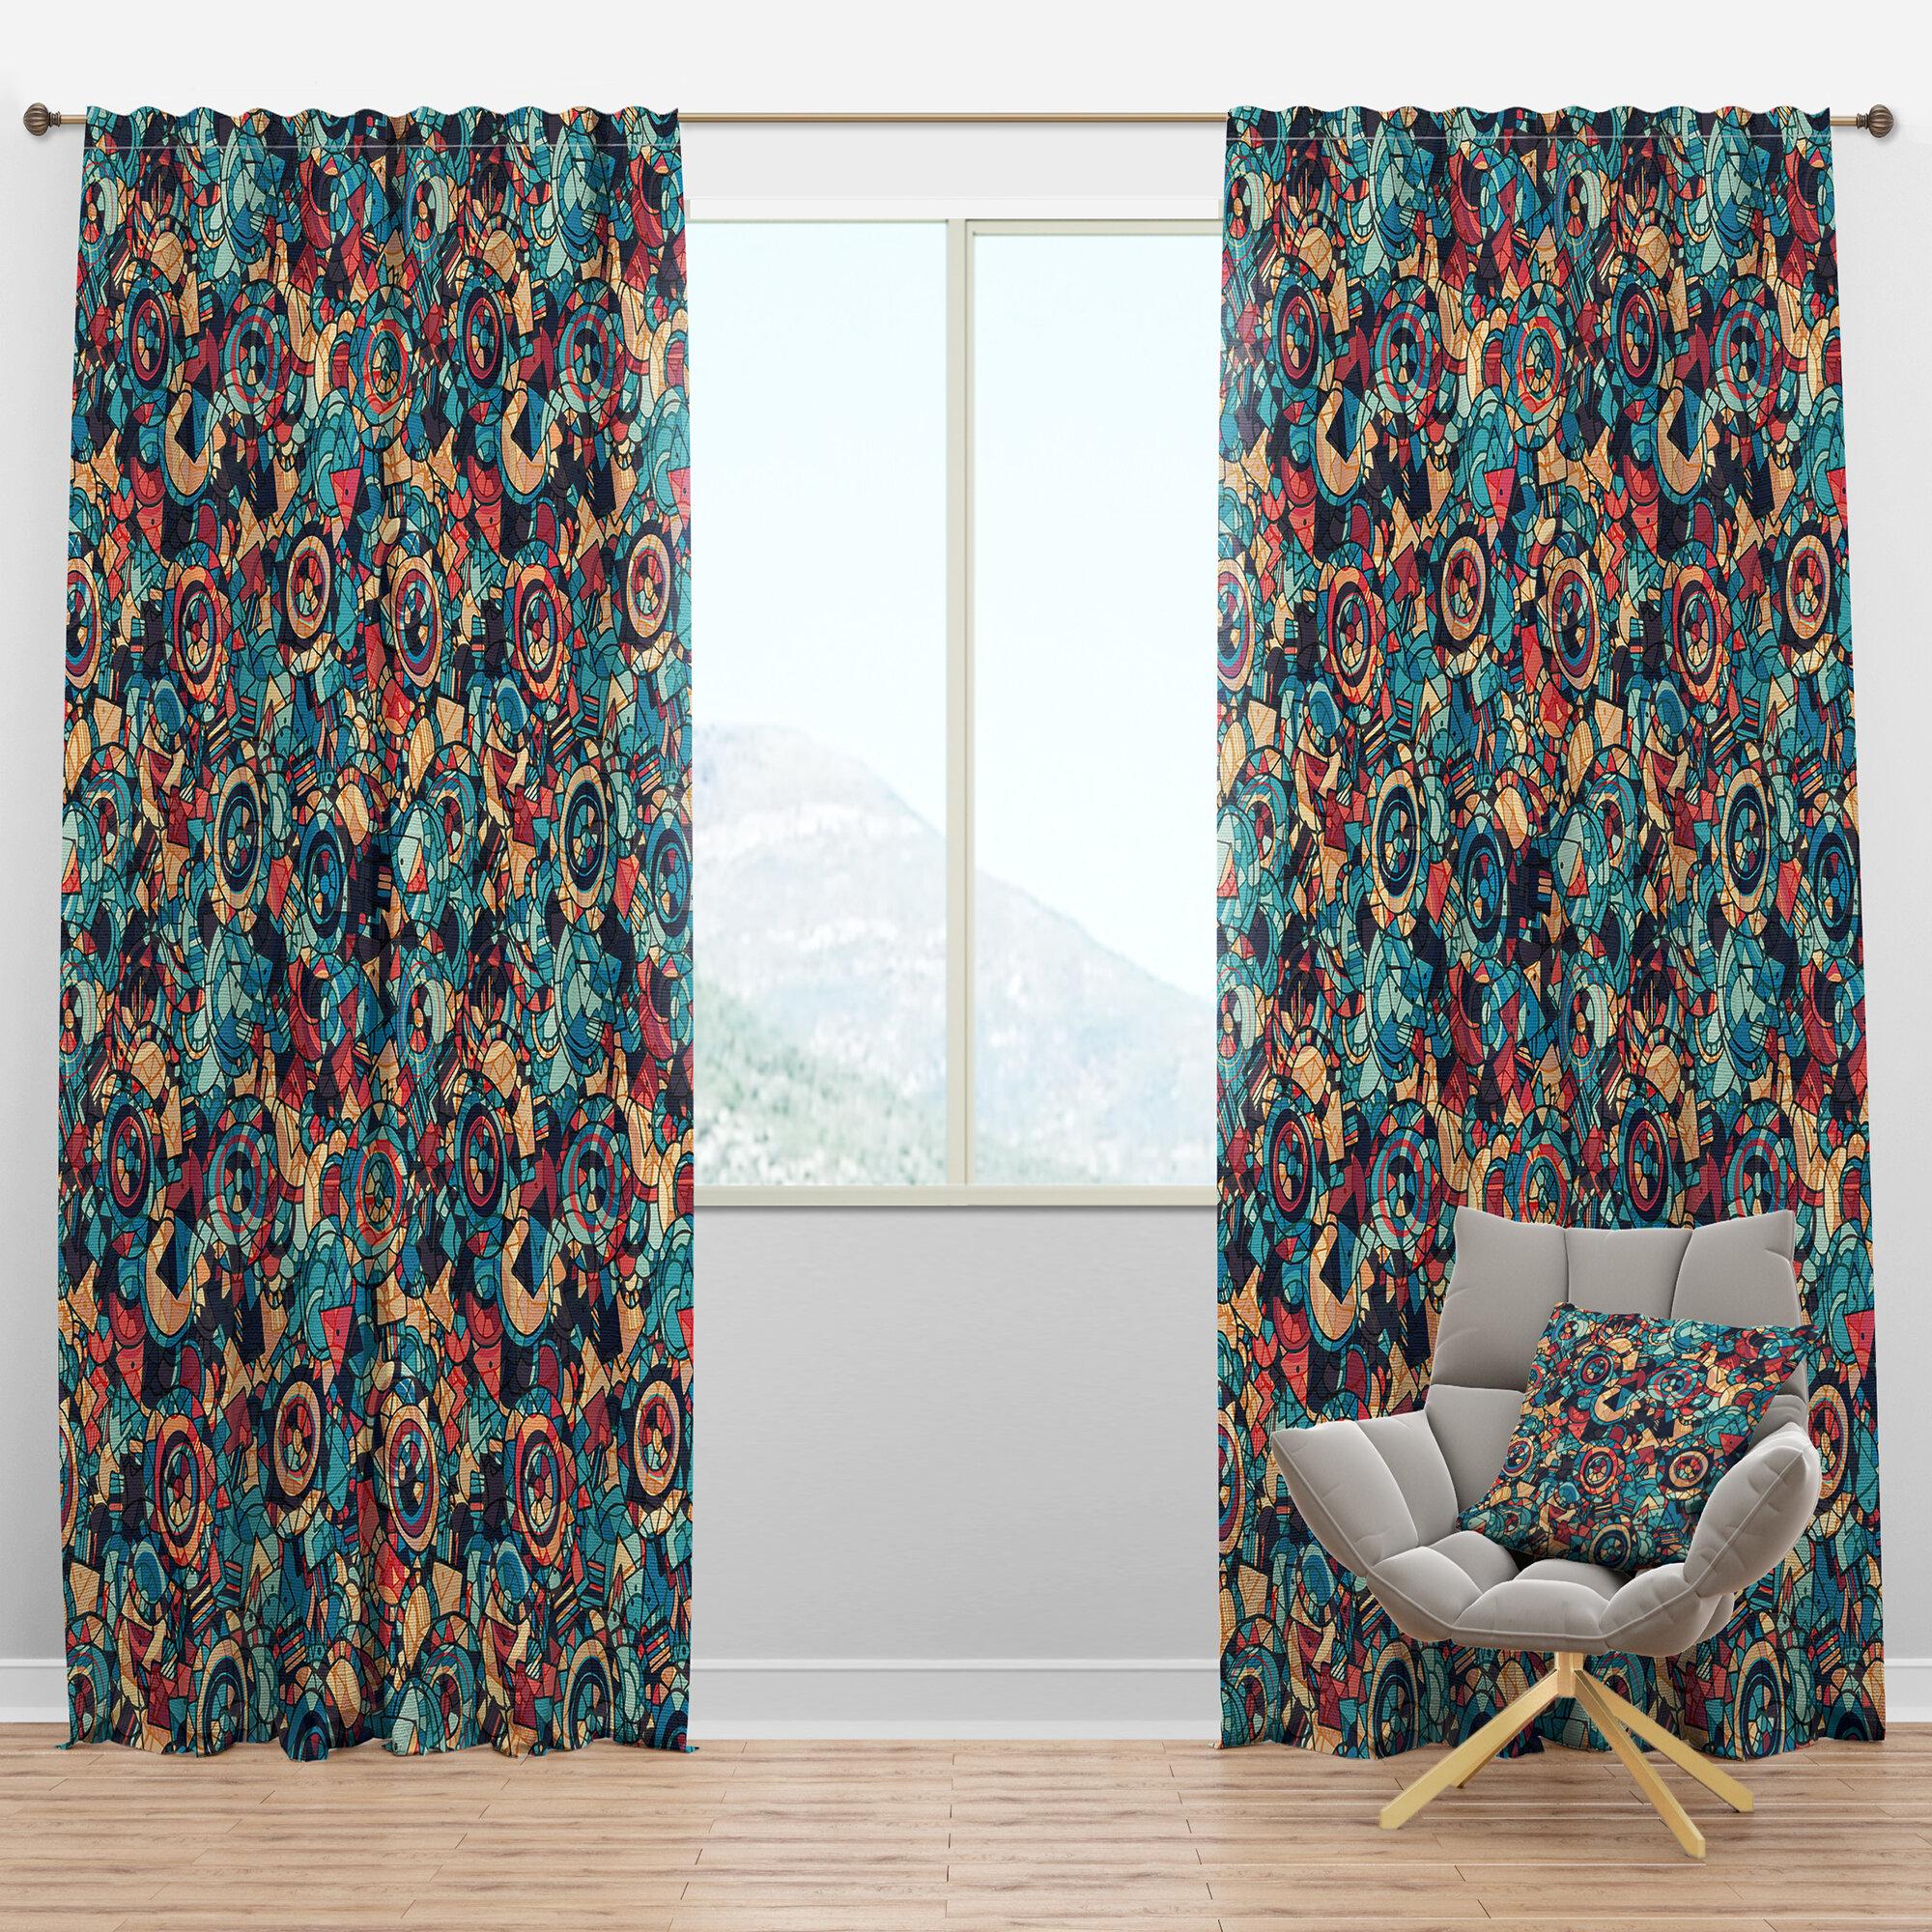 Designart Hand Drawn Semi Sheer Thermal Rod Pocket Curtain Panel Wayfair